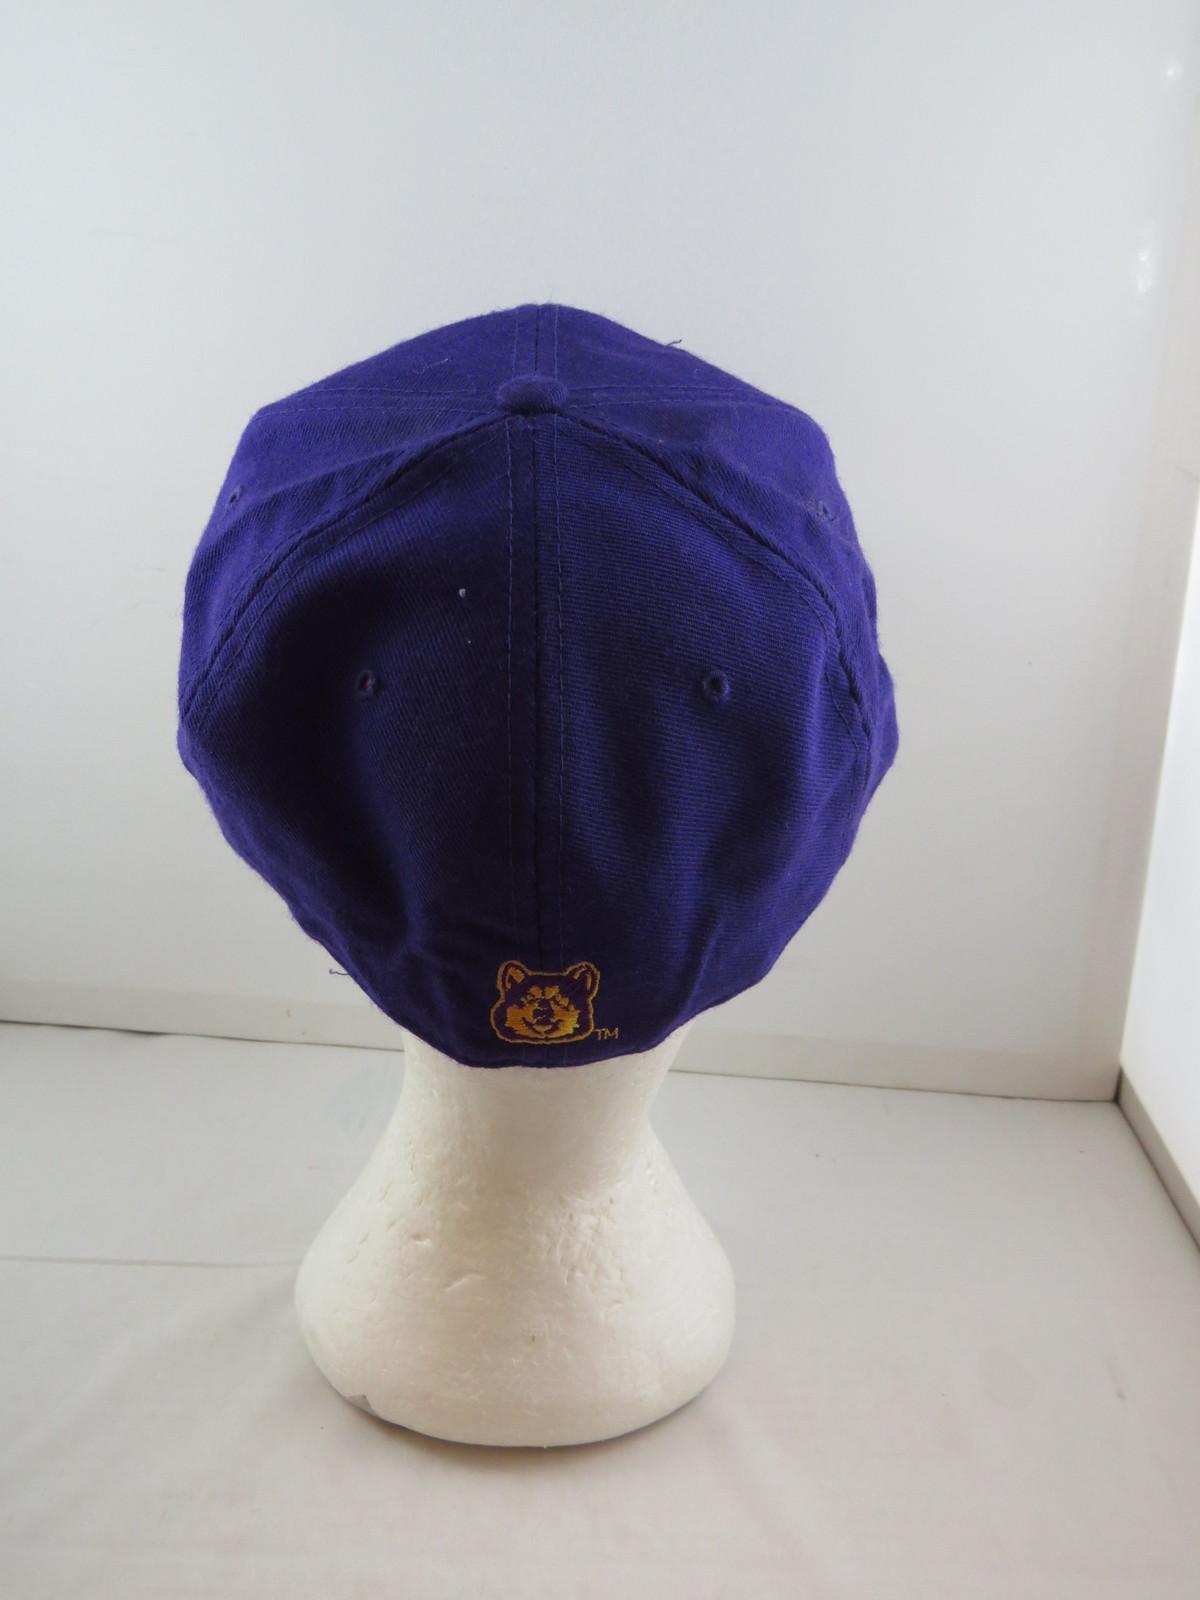 los angeles d577c a1051 Washington Huskies Hat (VTG) - New Era Pro Model Wool Blend - Fitted Size